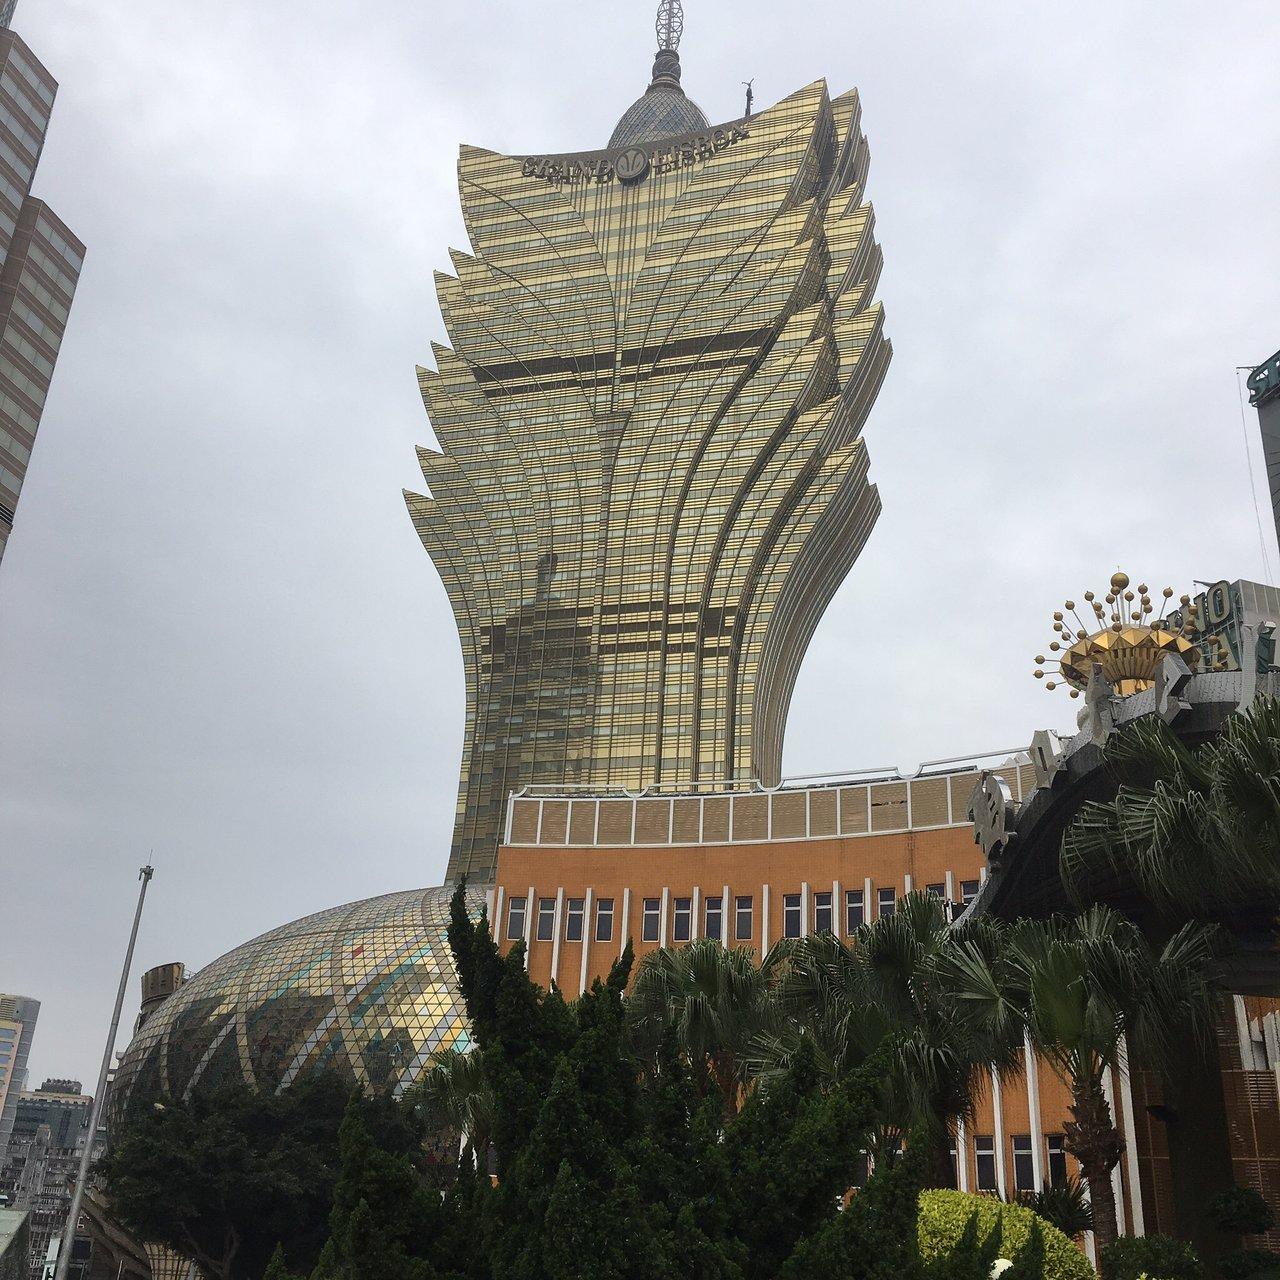 Ang dating Daan Macau adress